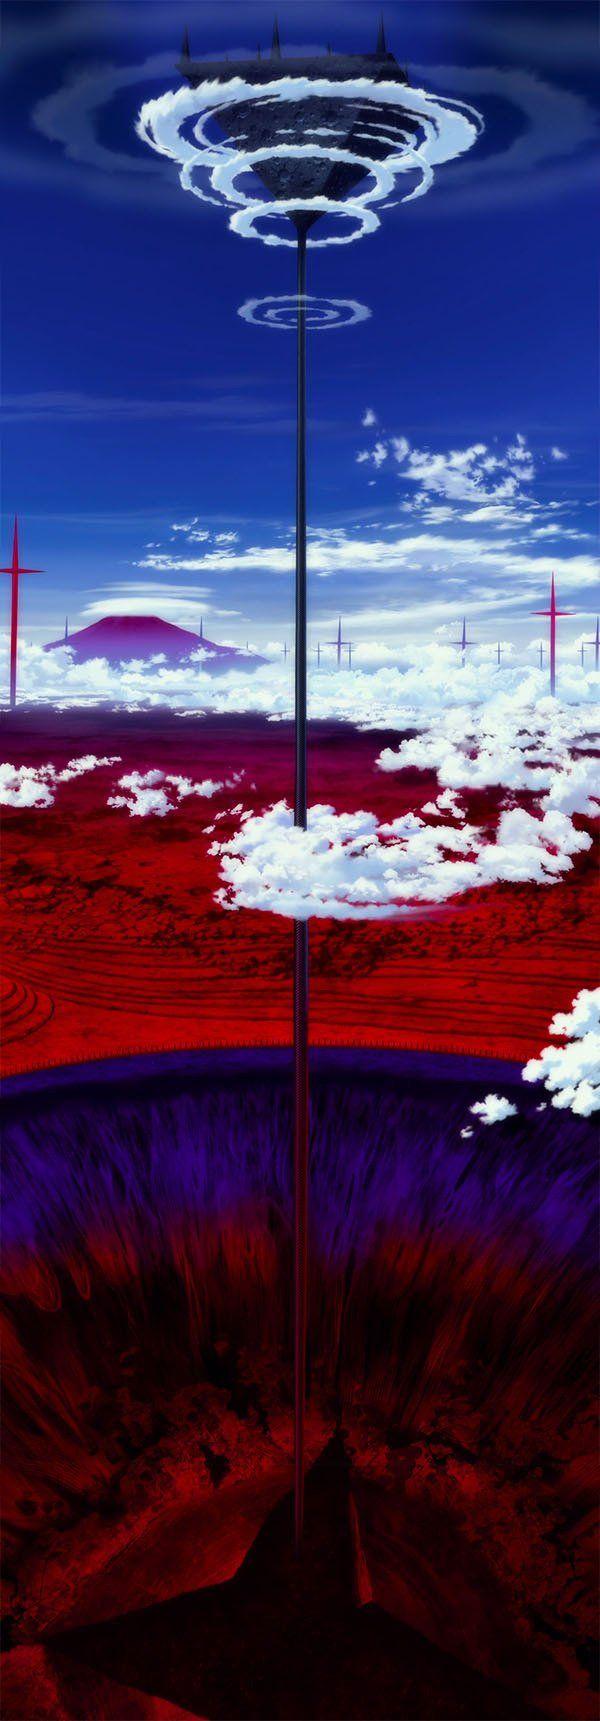 Detalles de Evangelion 3.33 que no viste